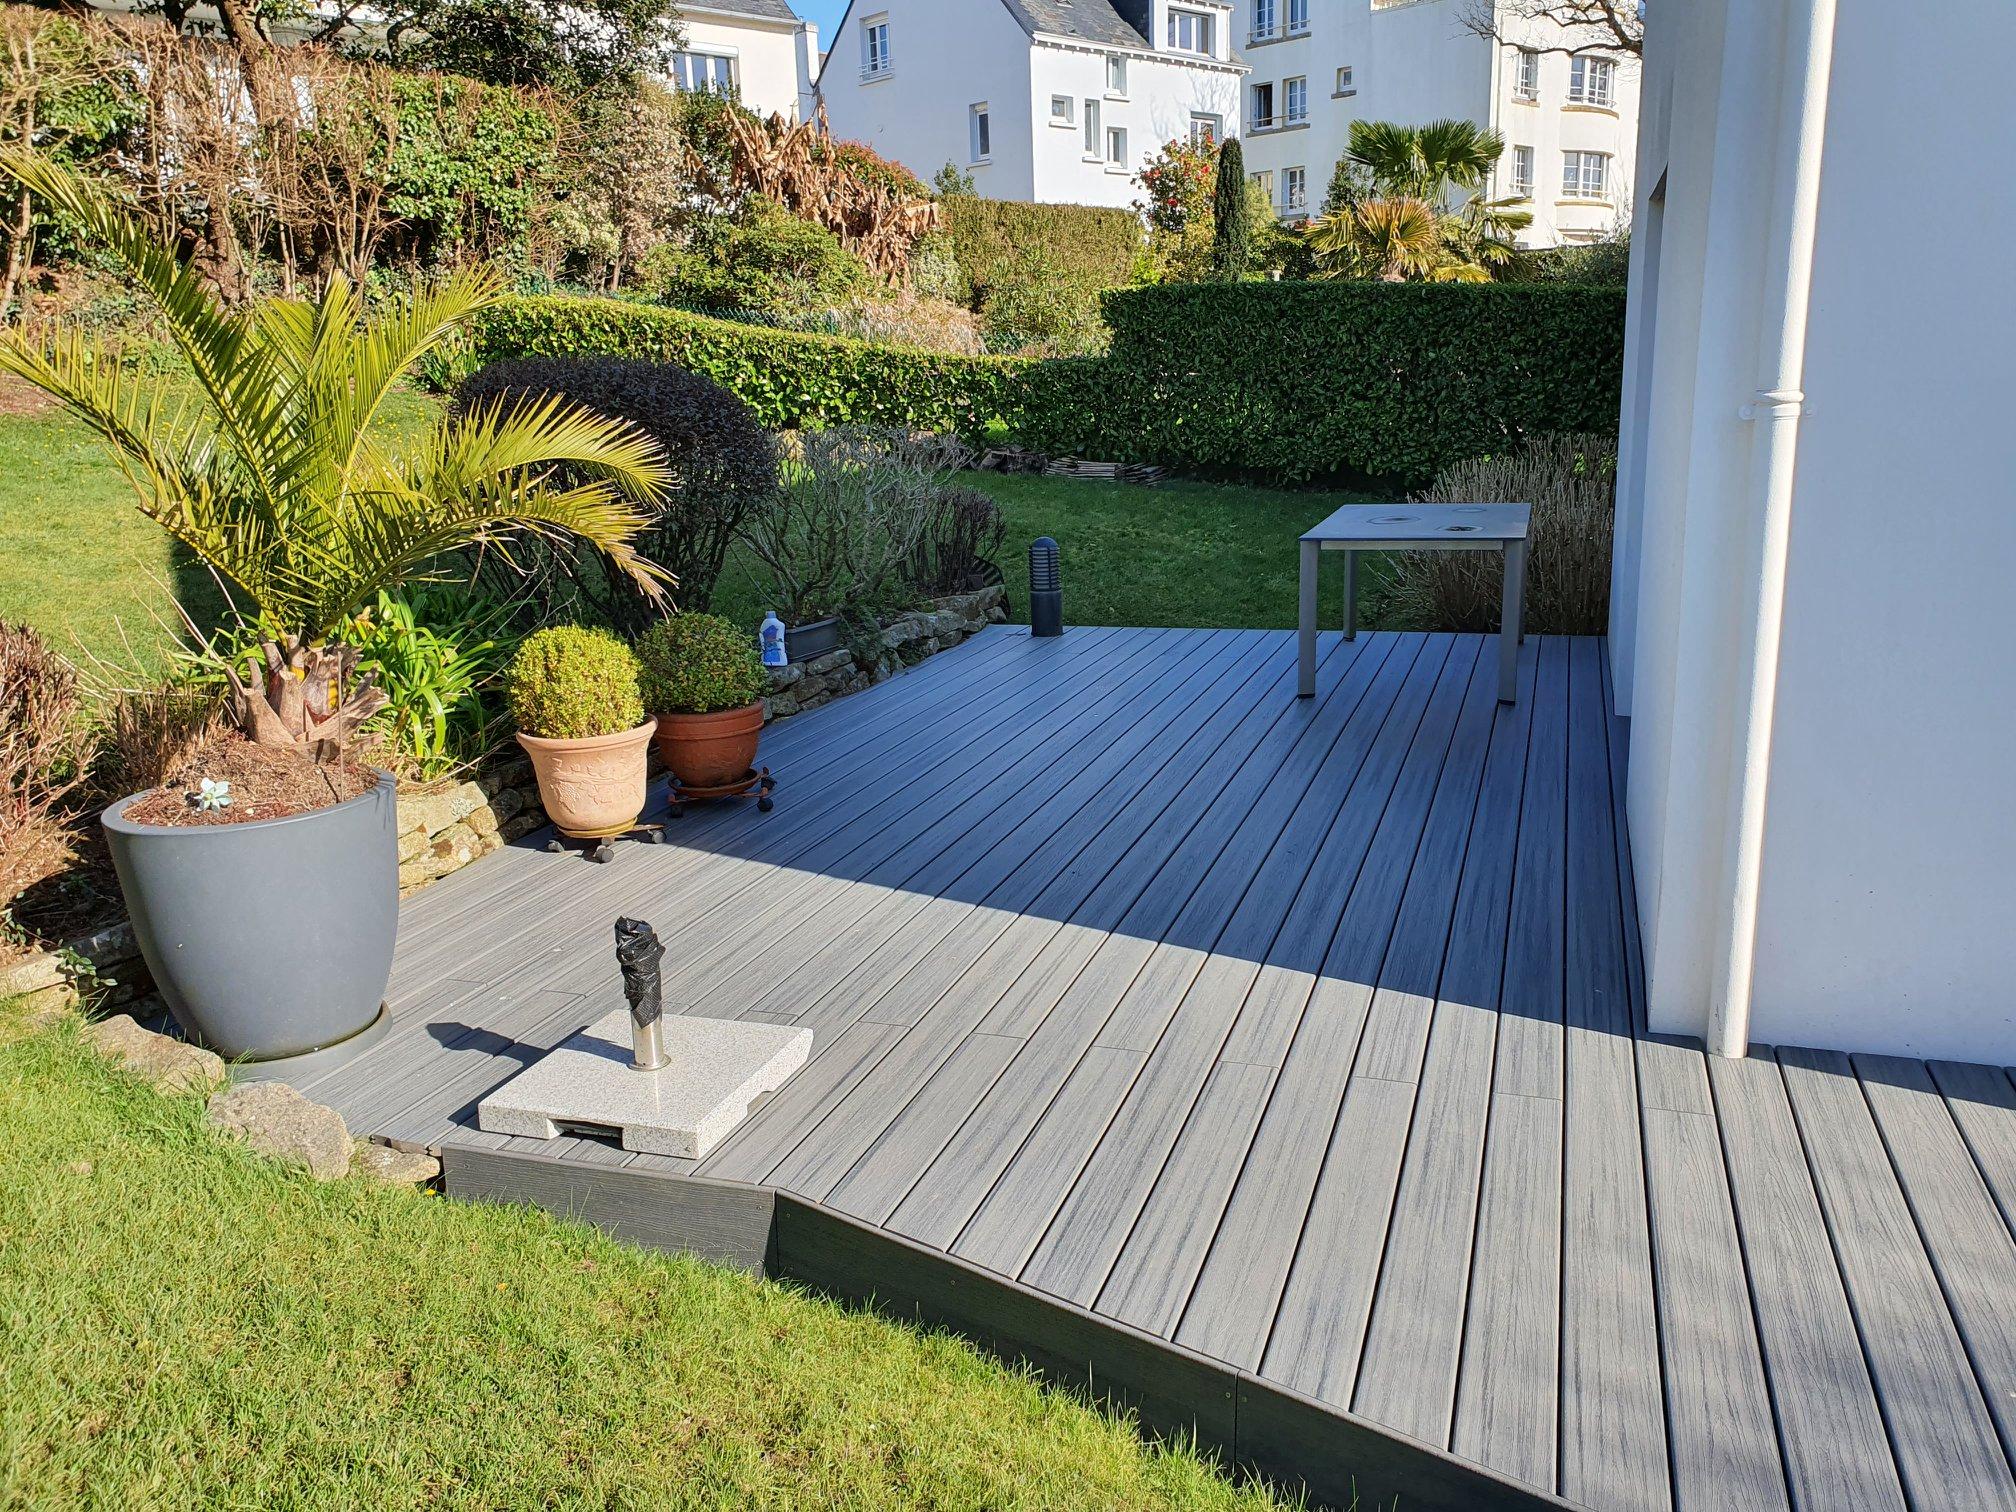 1626335829 832 Realisation dune terrasse en composite TREX de co - Réalisation d'une terrasse en composite TREX de co...